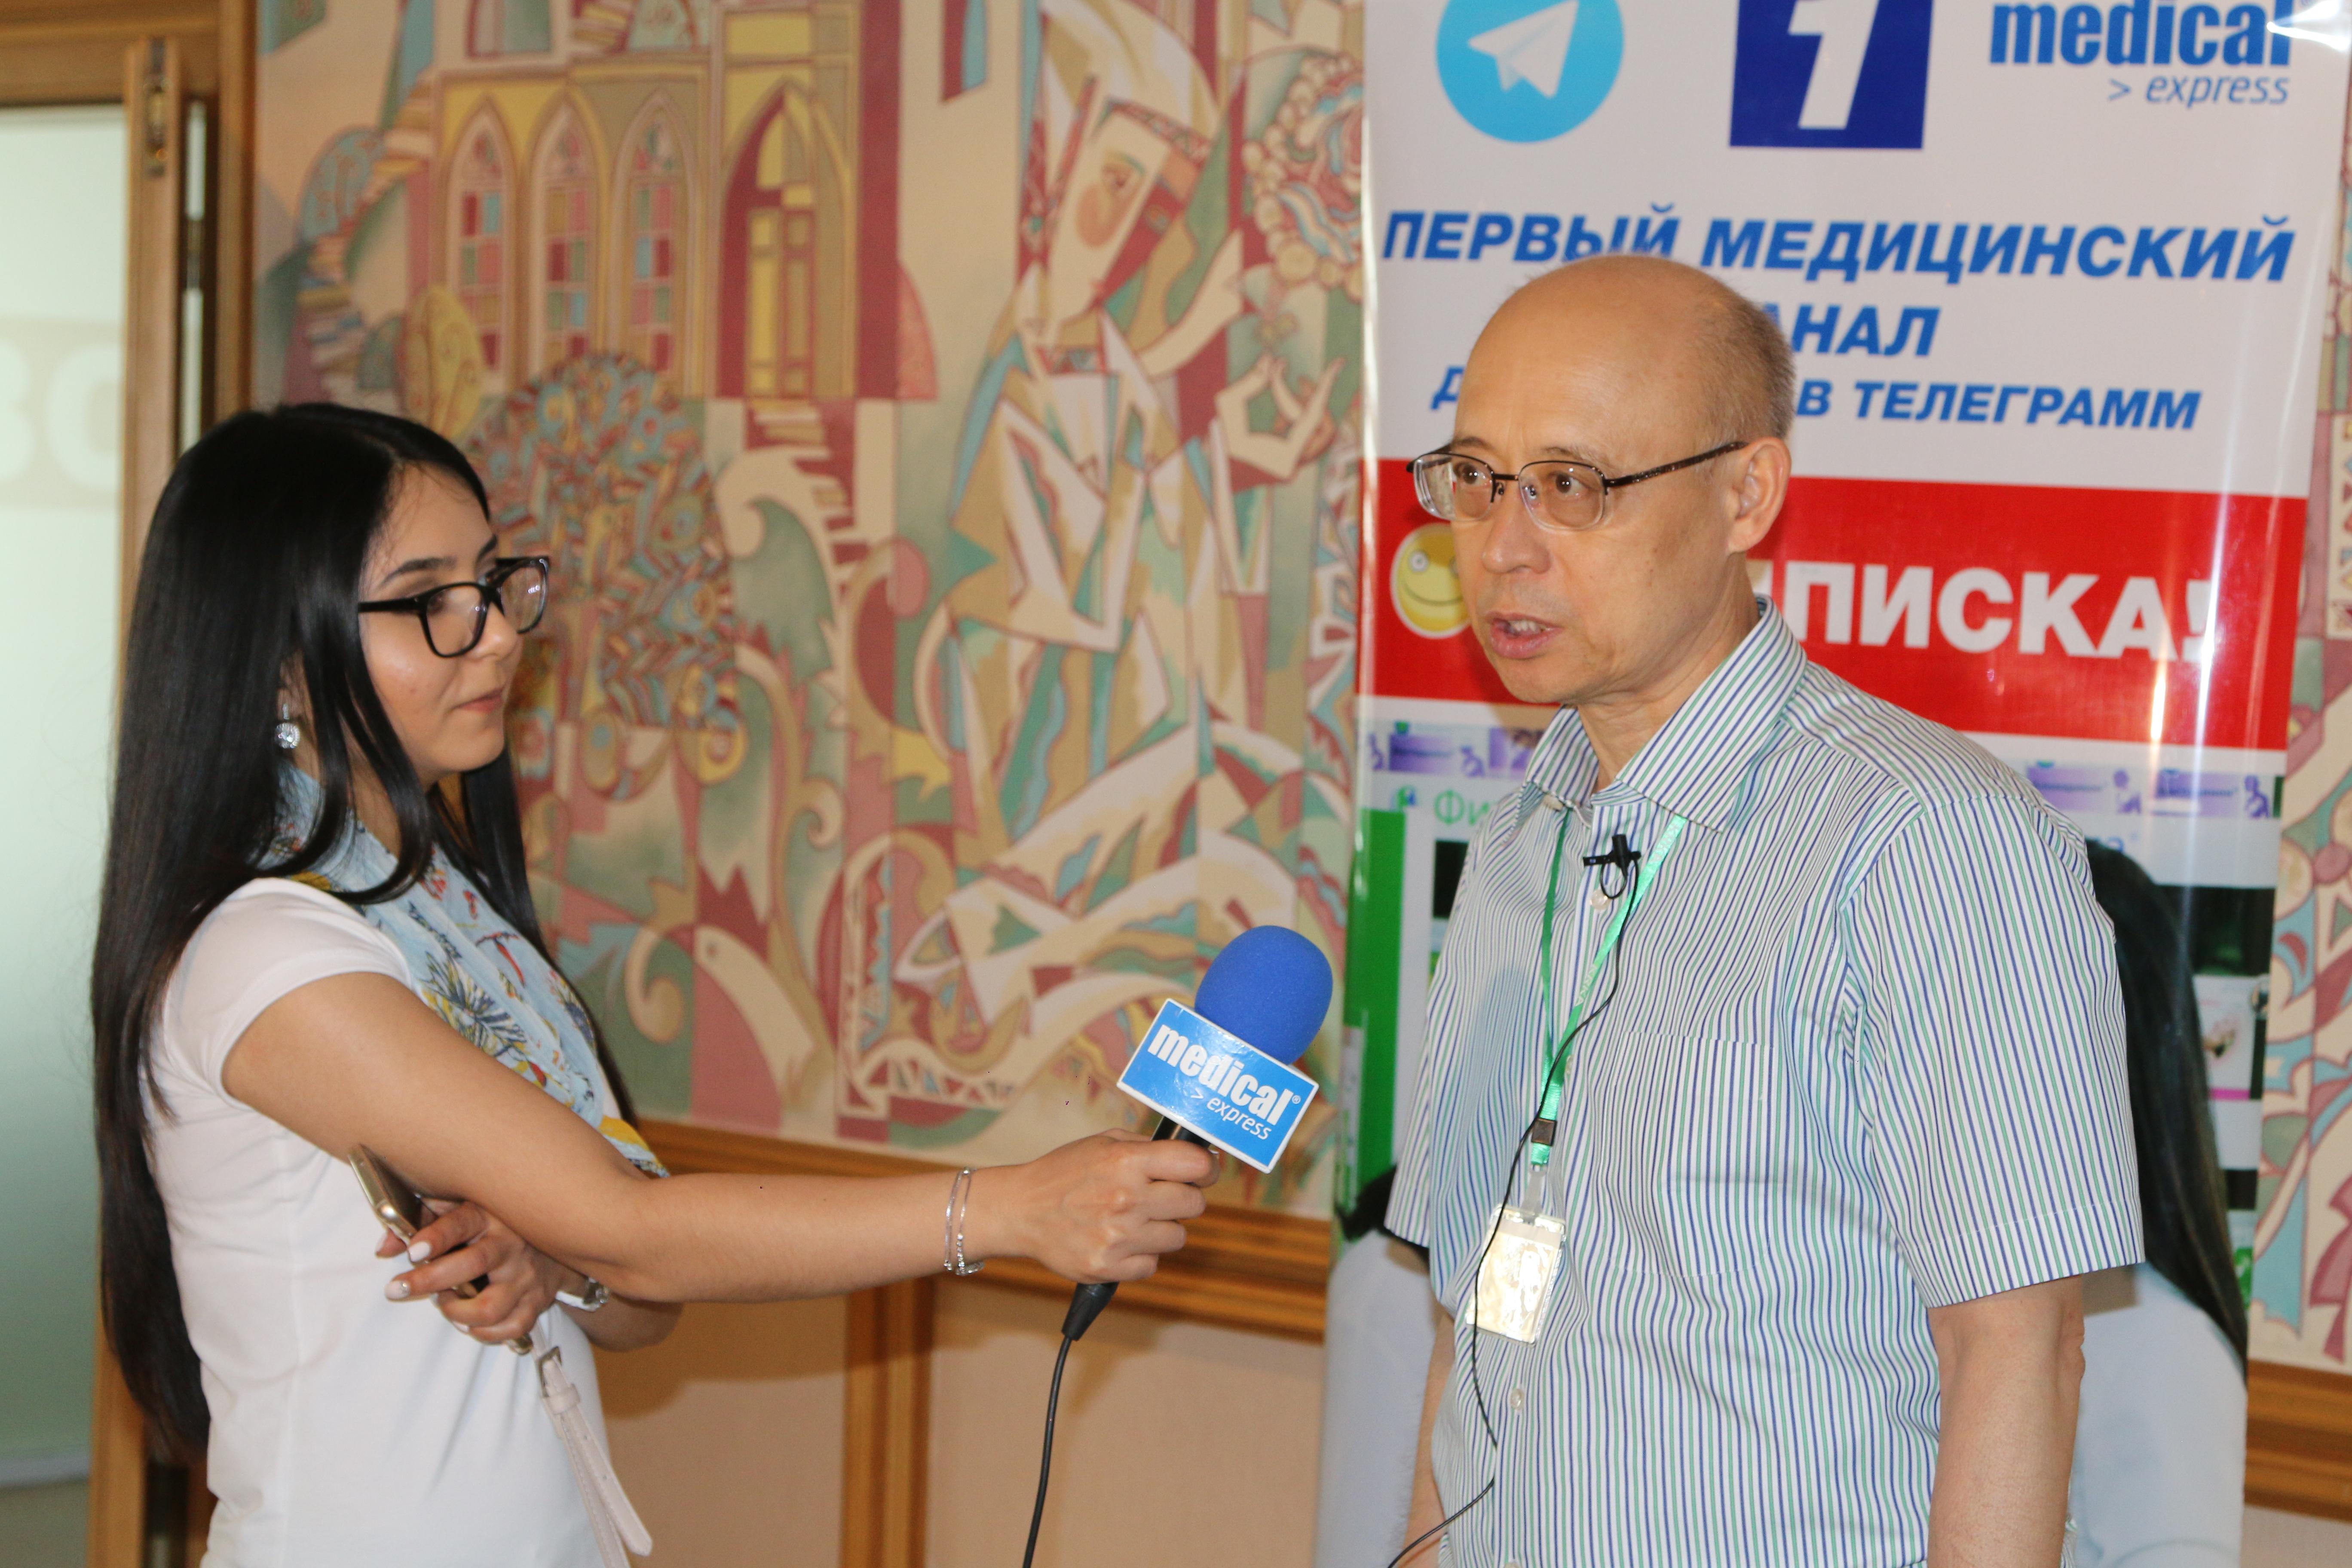 http://medicalexpress.ru/uploads/news/EAK/serve/IMG_7640.JPG